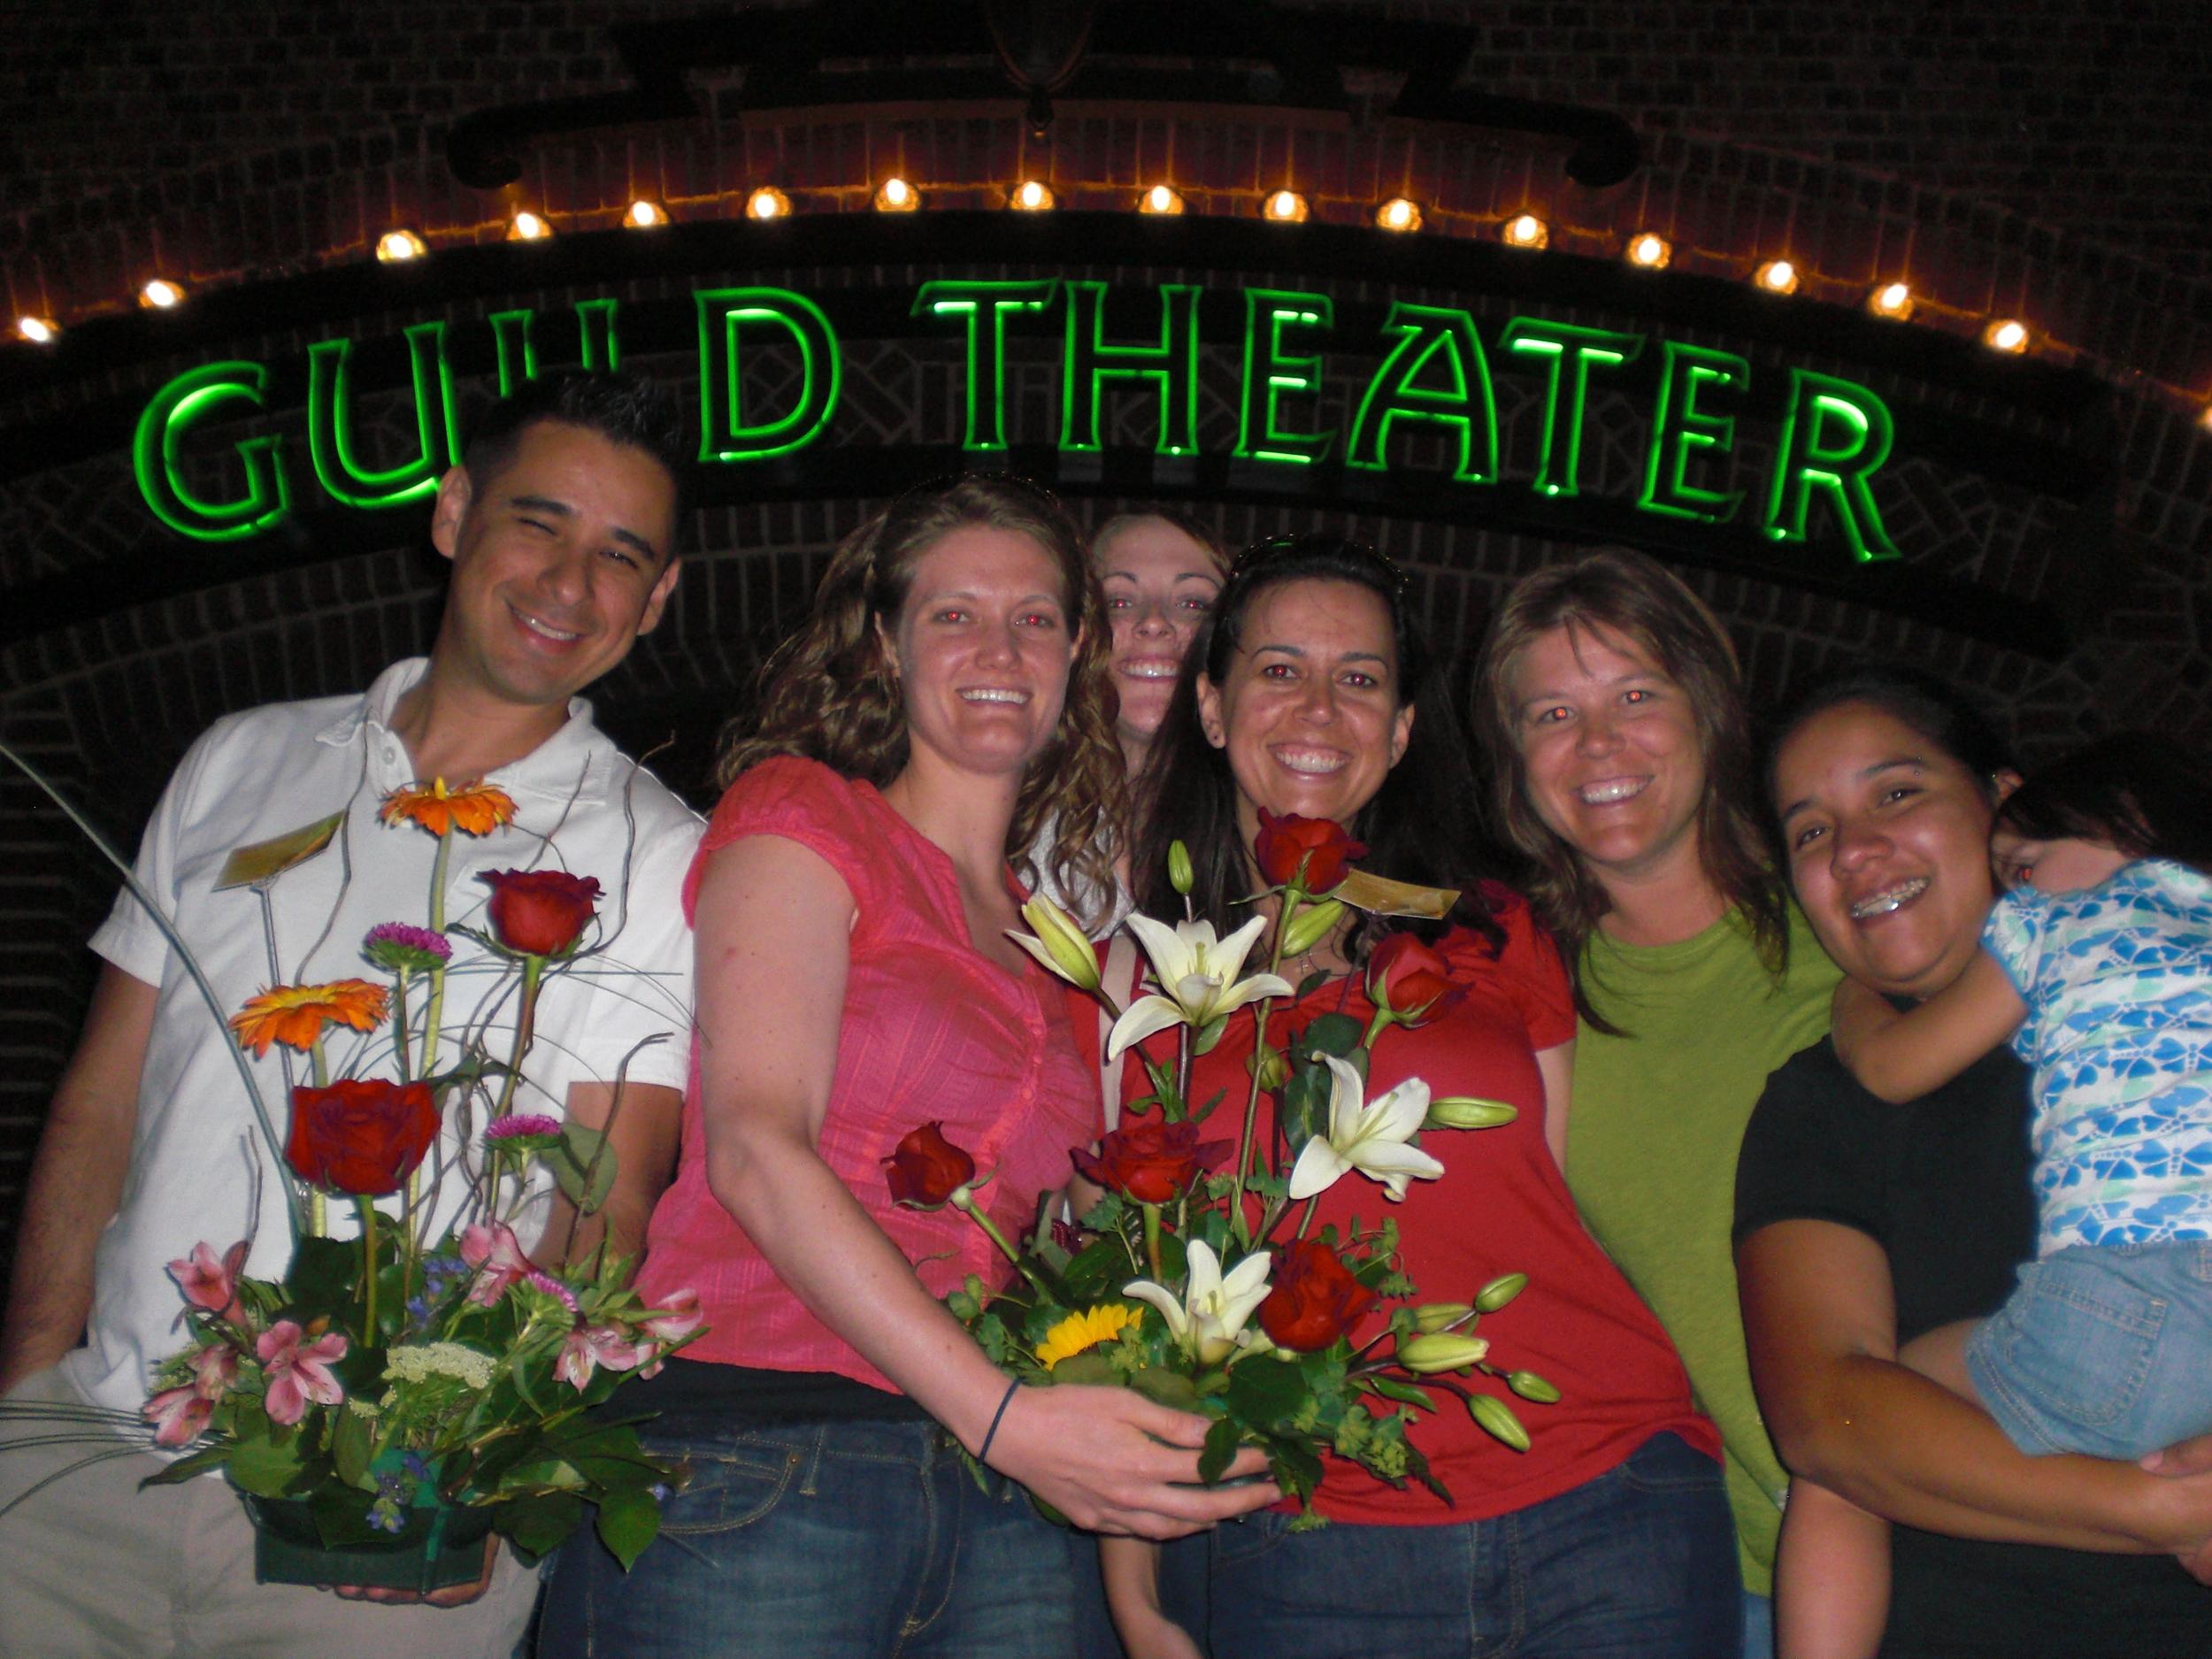 Arnold, Tara, Lisa, Debs, Em and Victoria